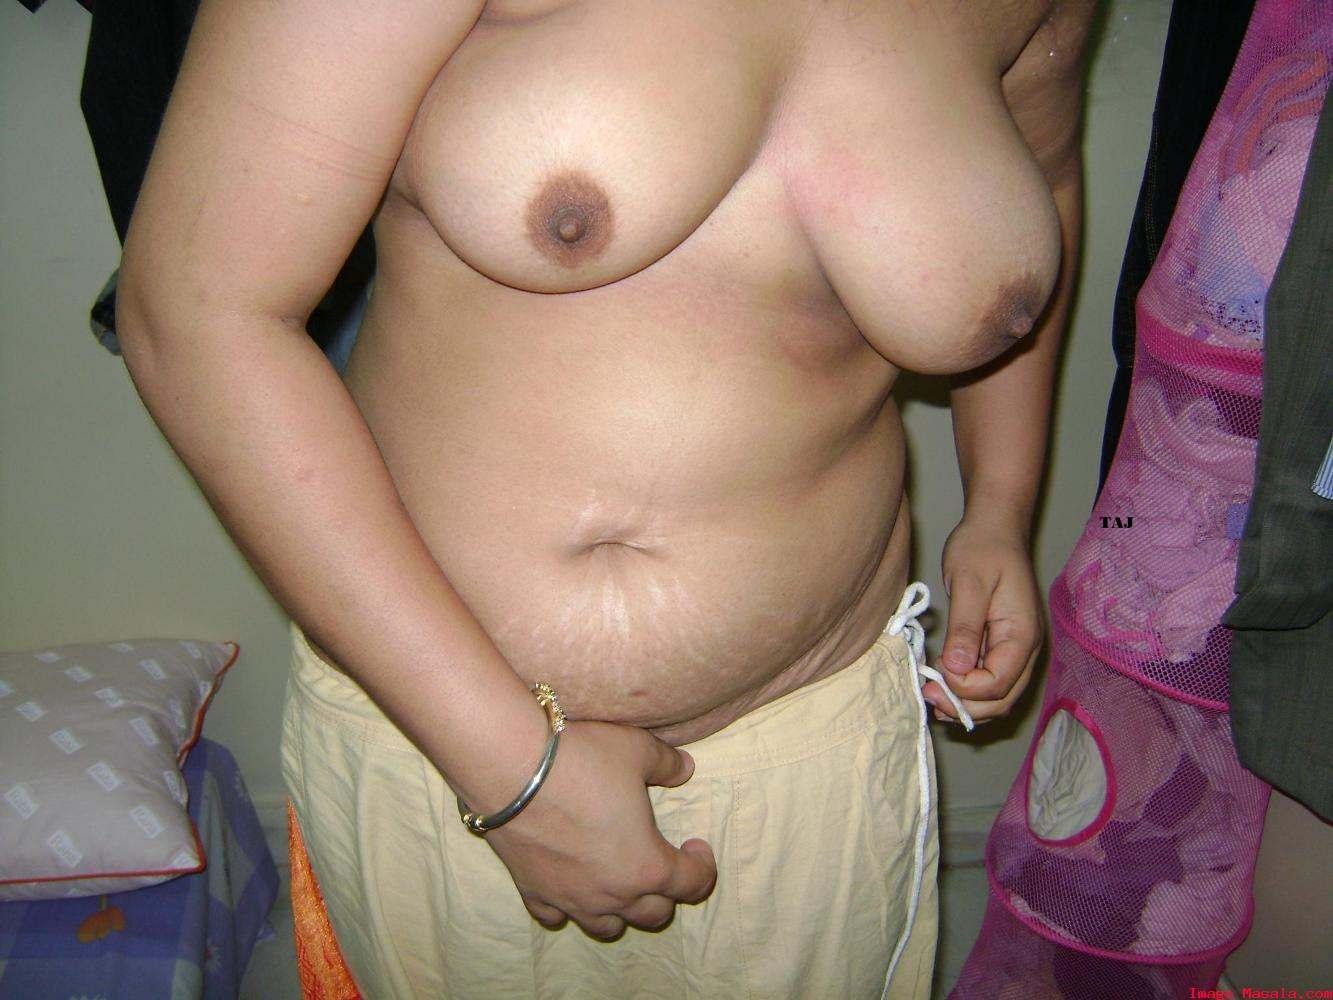 brazilian goddess janessa with perfect body and big boobs mastur